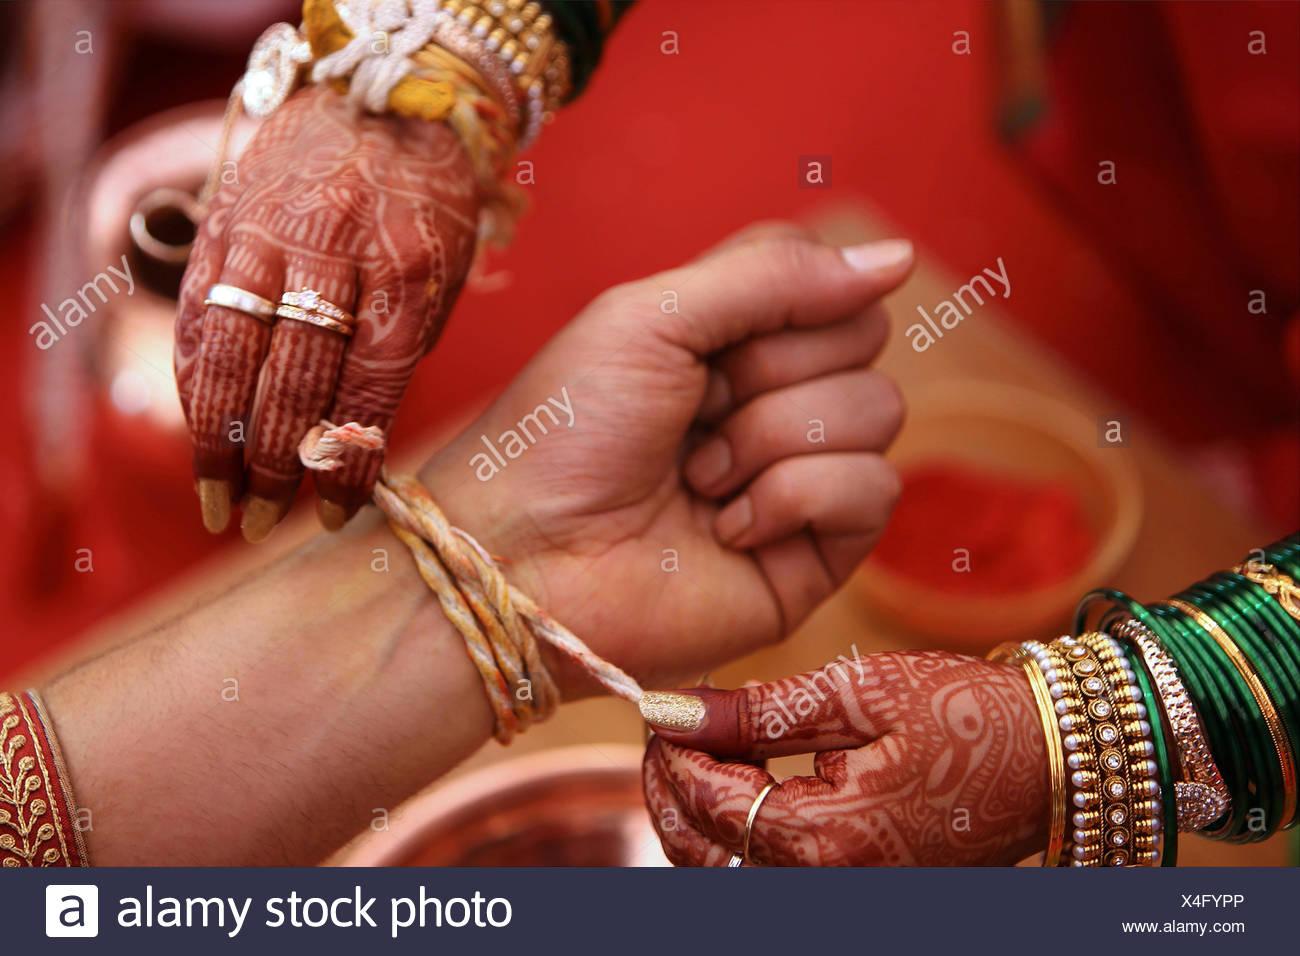 Wedding ritual, Kankana Dhaarana, a turmeric-stained thread wrapped around a turmeric root. - Stock Image